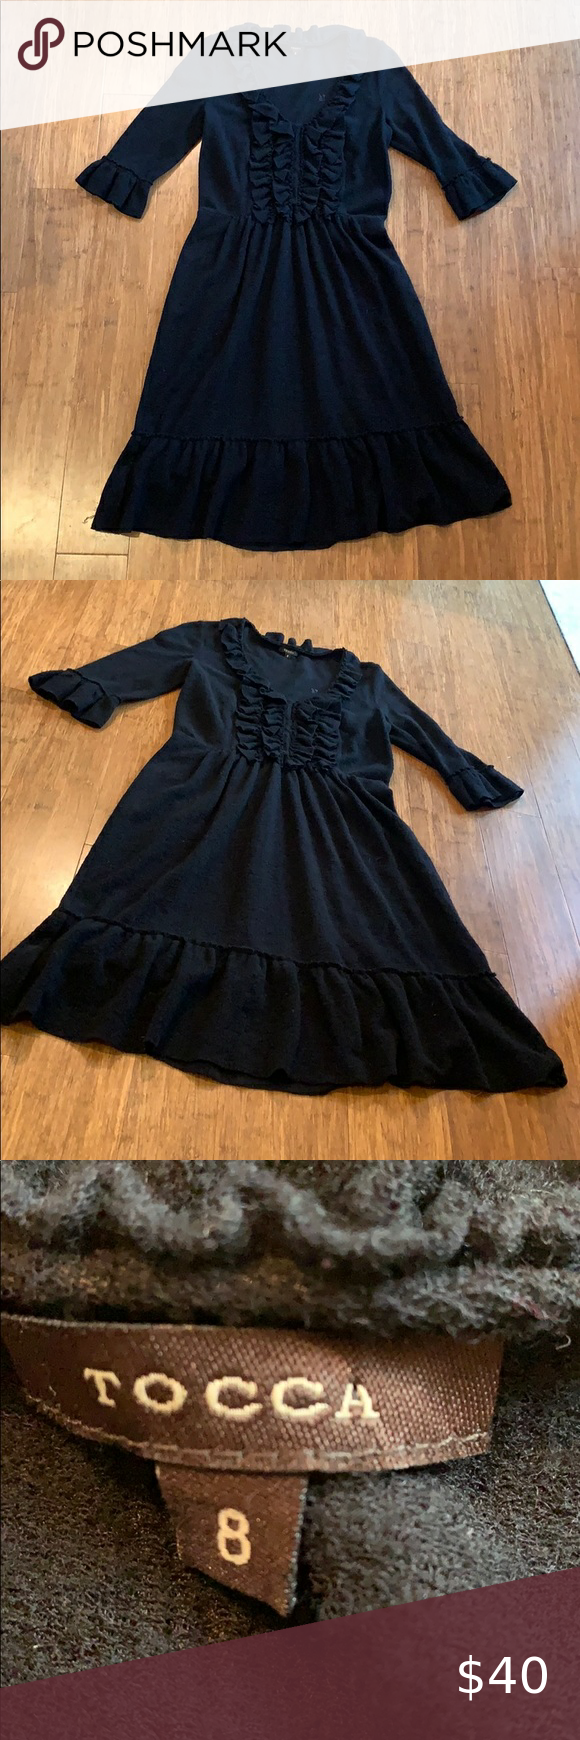 Tocca Audrey Ruffle Peplum Black Dress Black Peplum Dress Black Dress Dresses [ 1740 x 580 Pixel ]